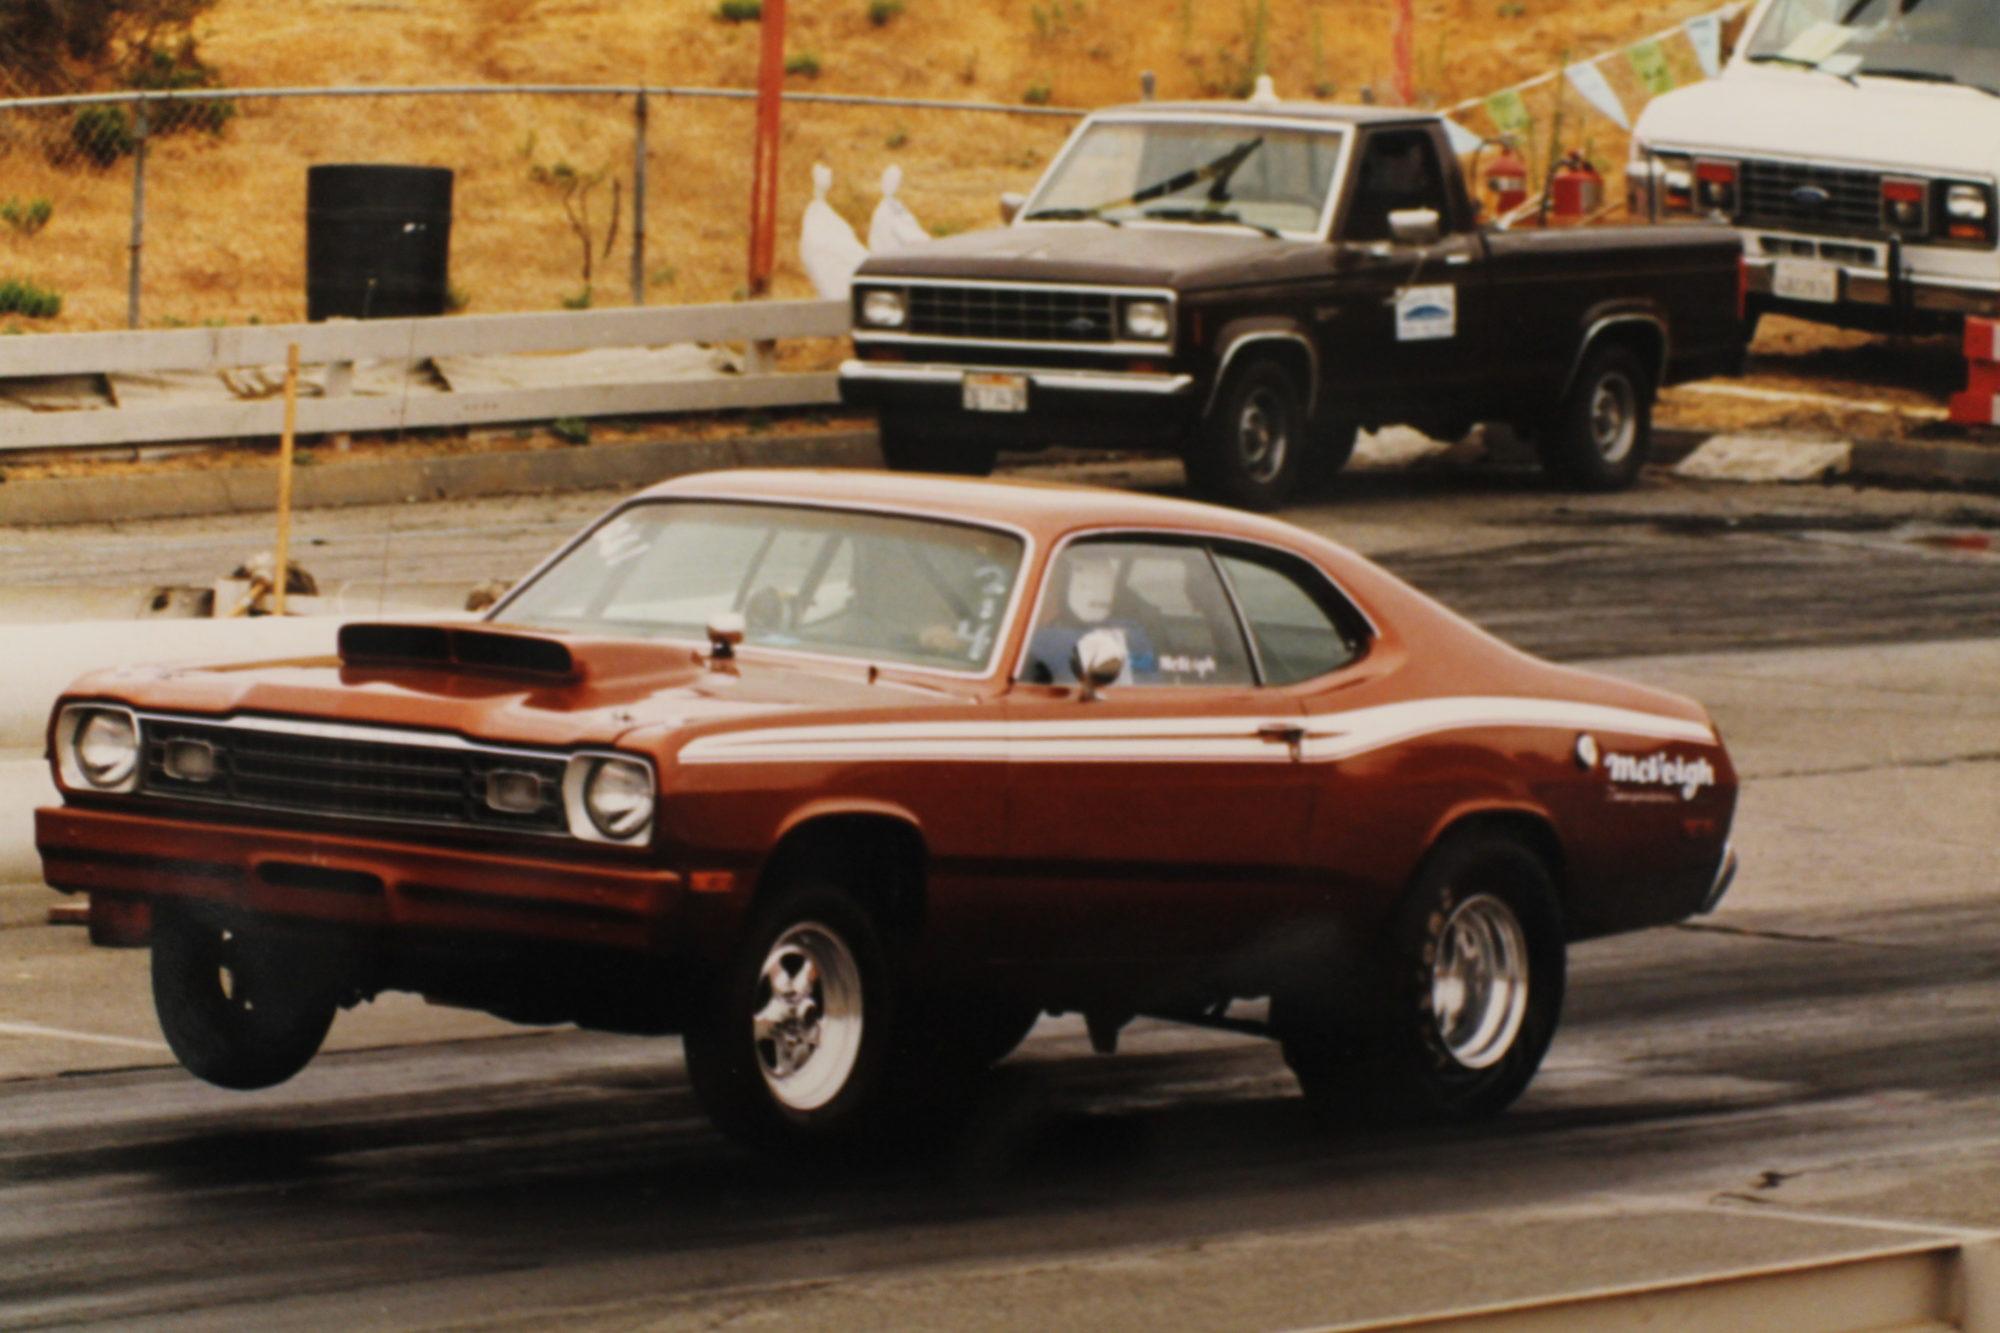 Bill McVeigh 1973 Duster